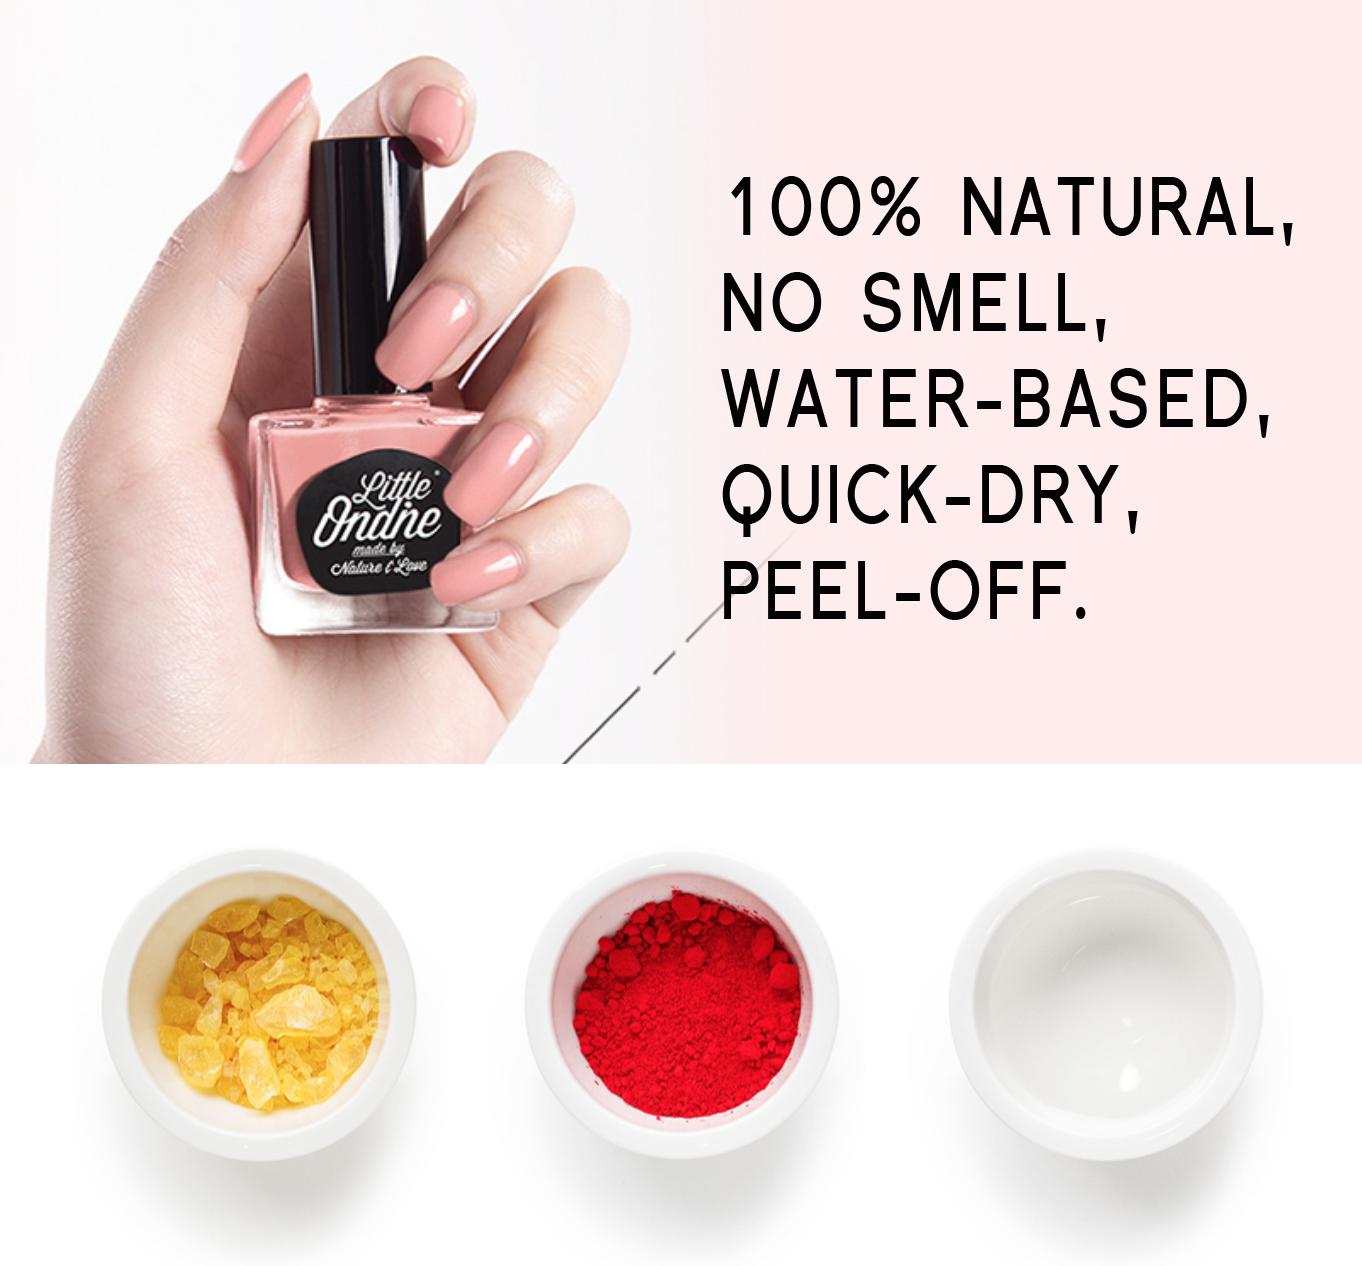 Little Ondine™ Natural Vegan Nail Polish – London – Awake Organics